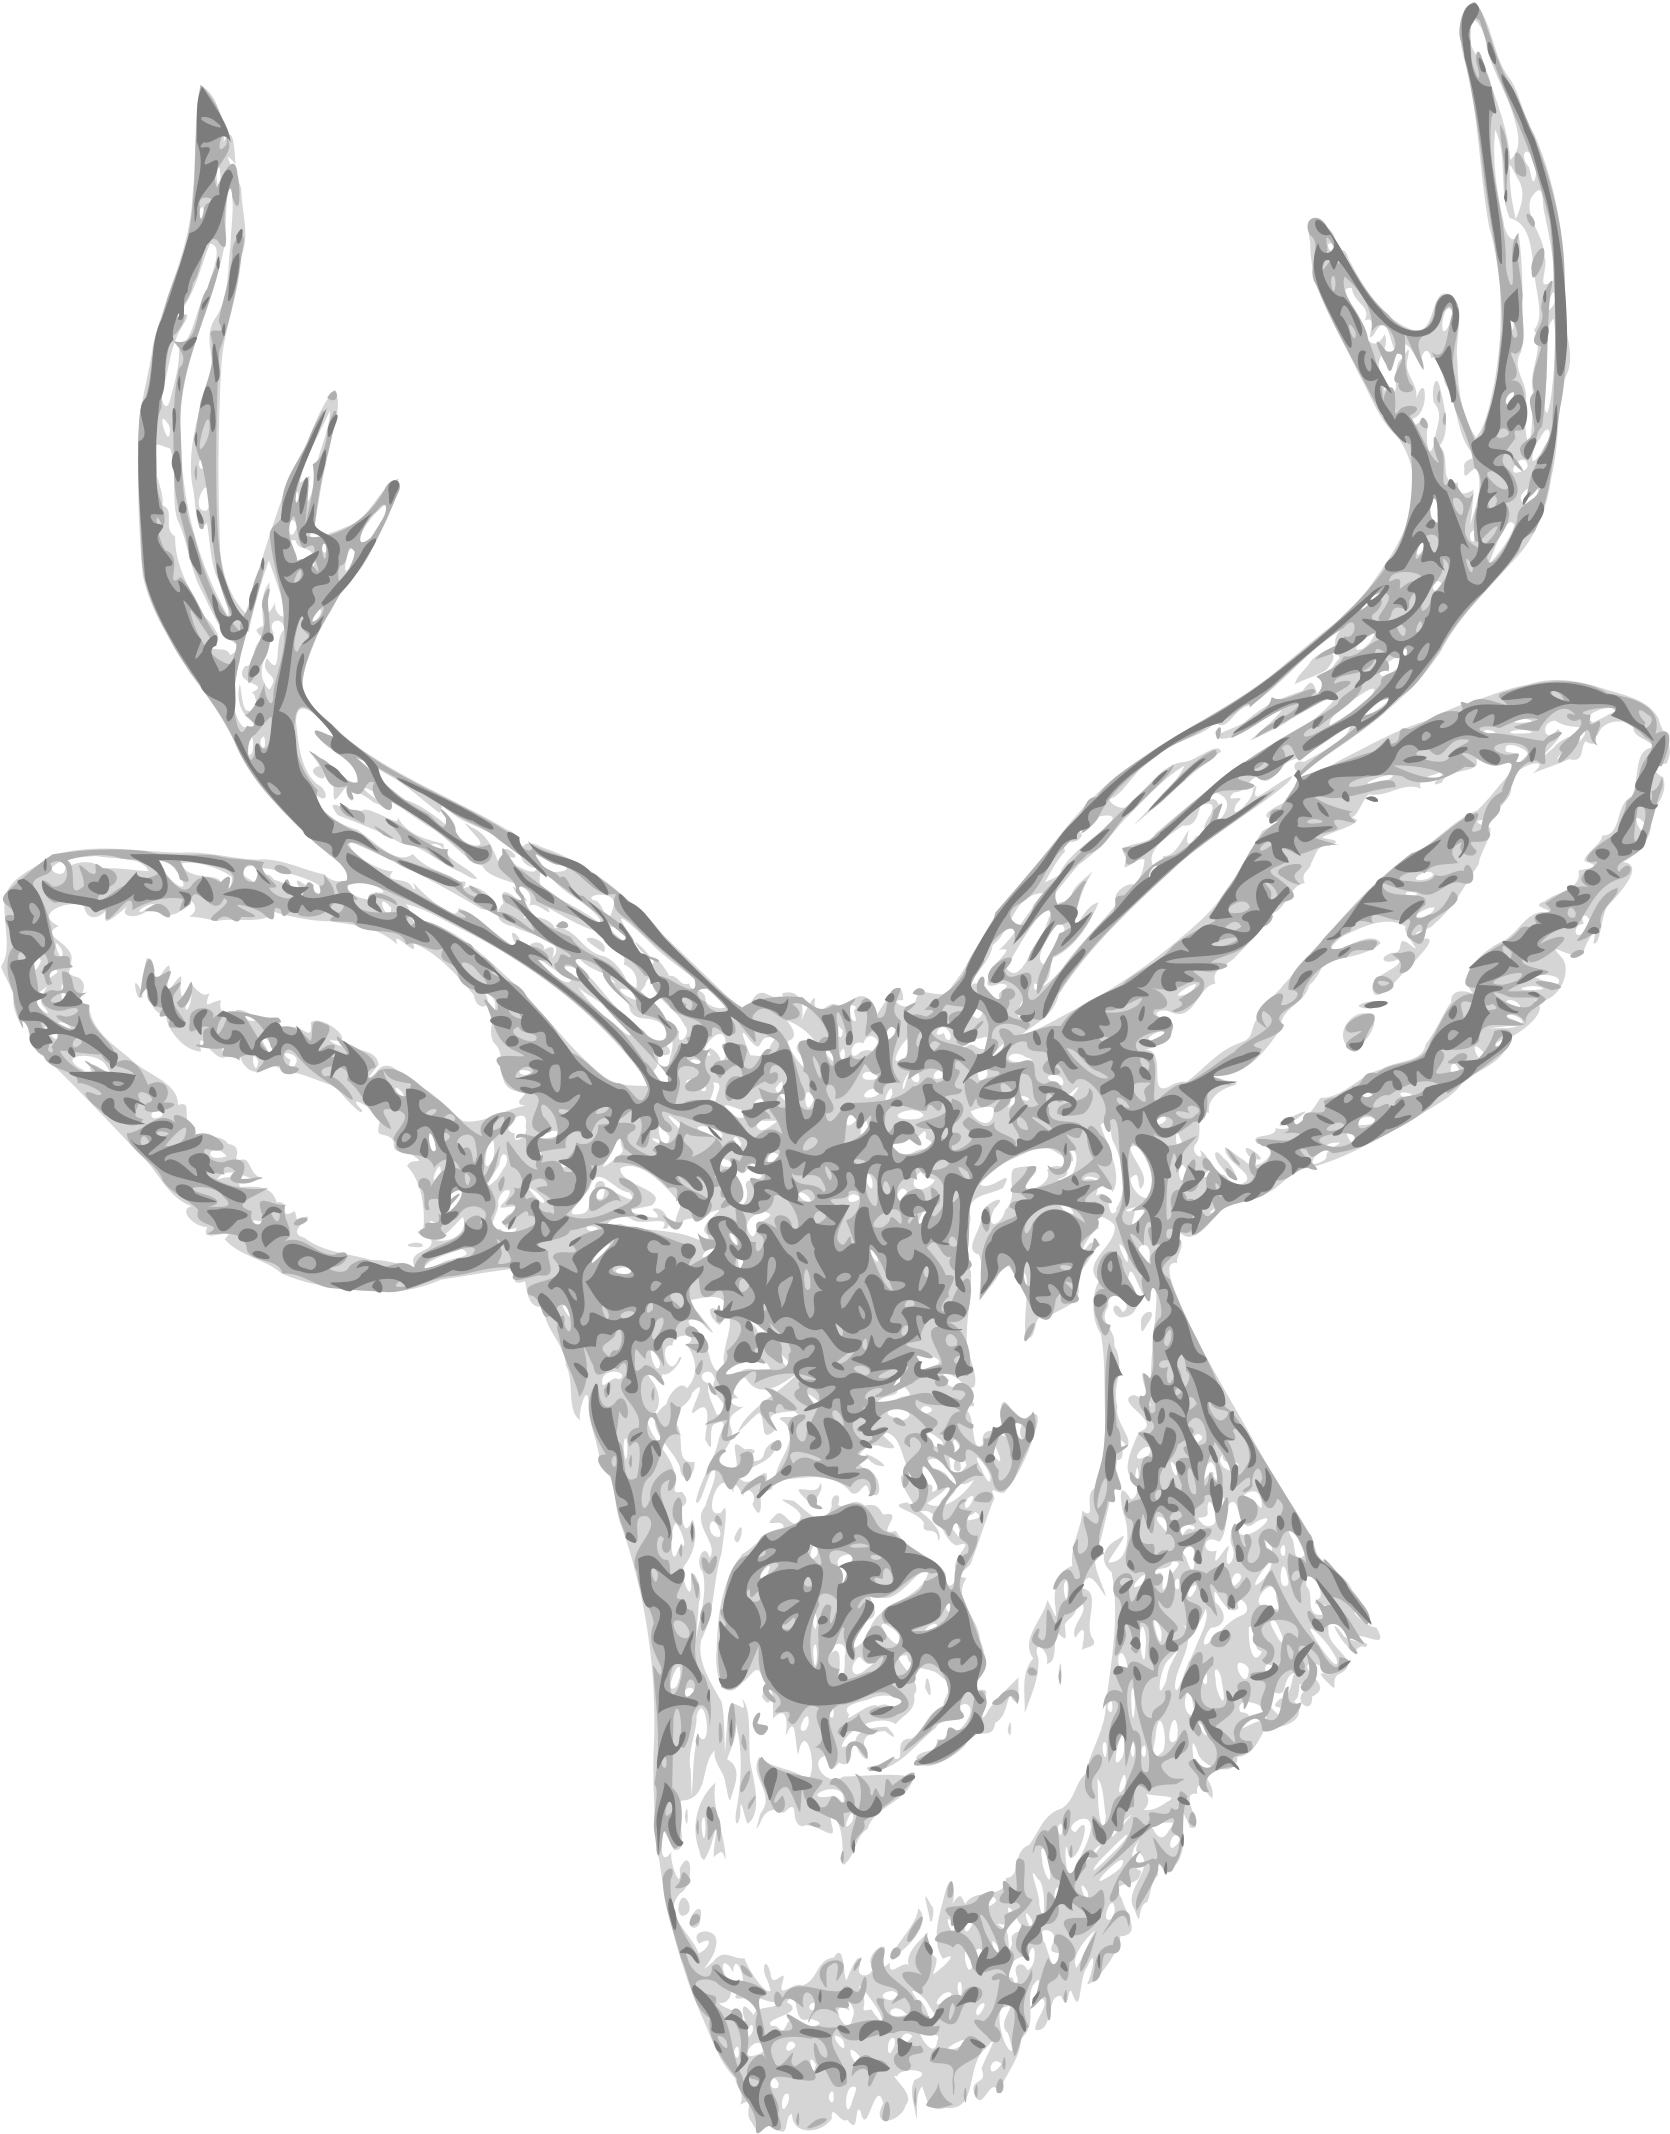 Download Deer Pencil Curtain Free - Deer Skull Tattoo ...